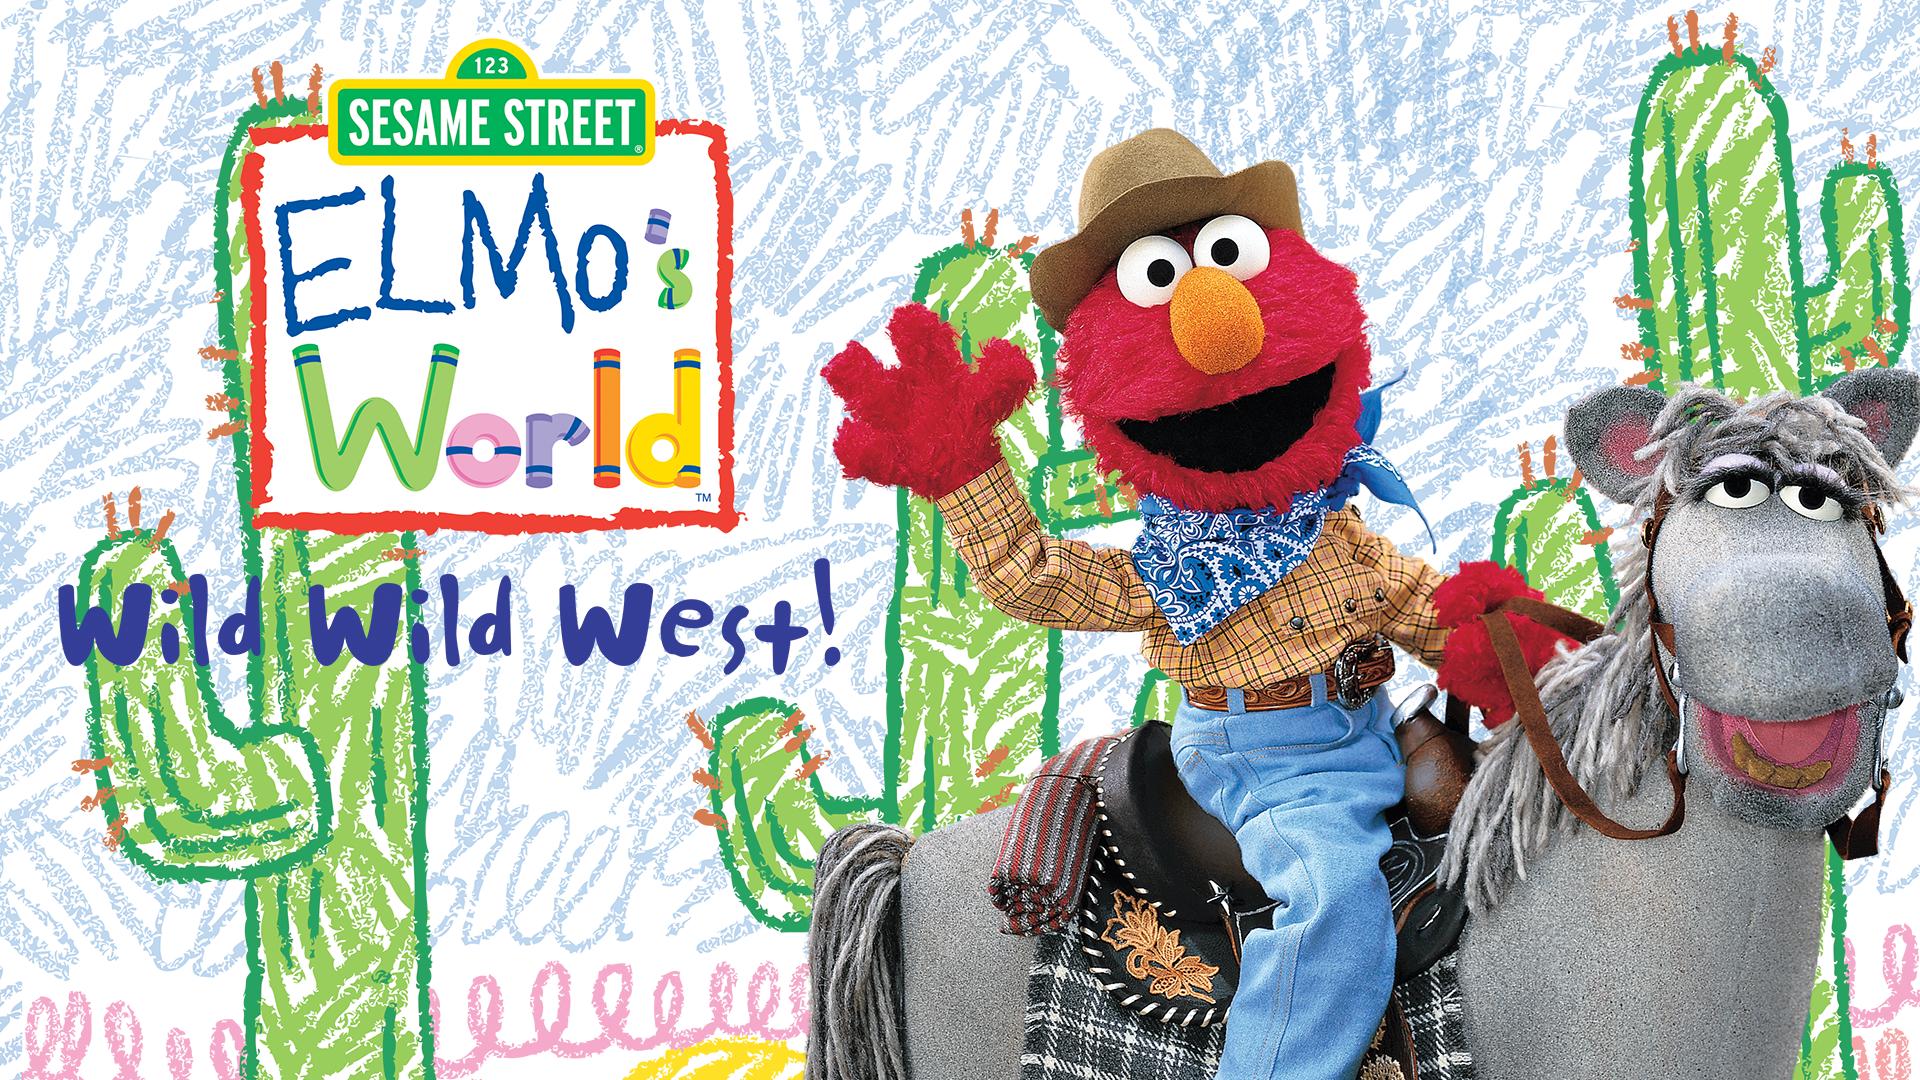 Sesame Street: Elmos Wild Wild West